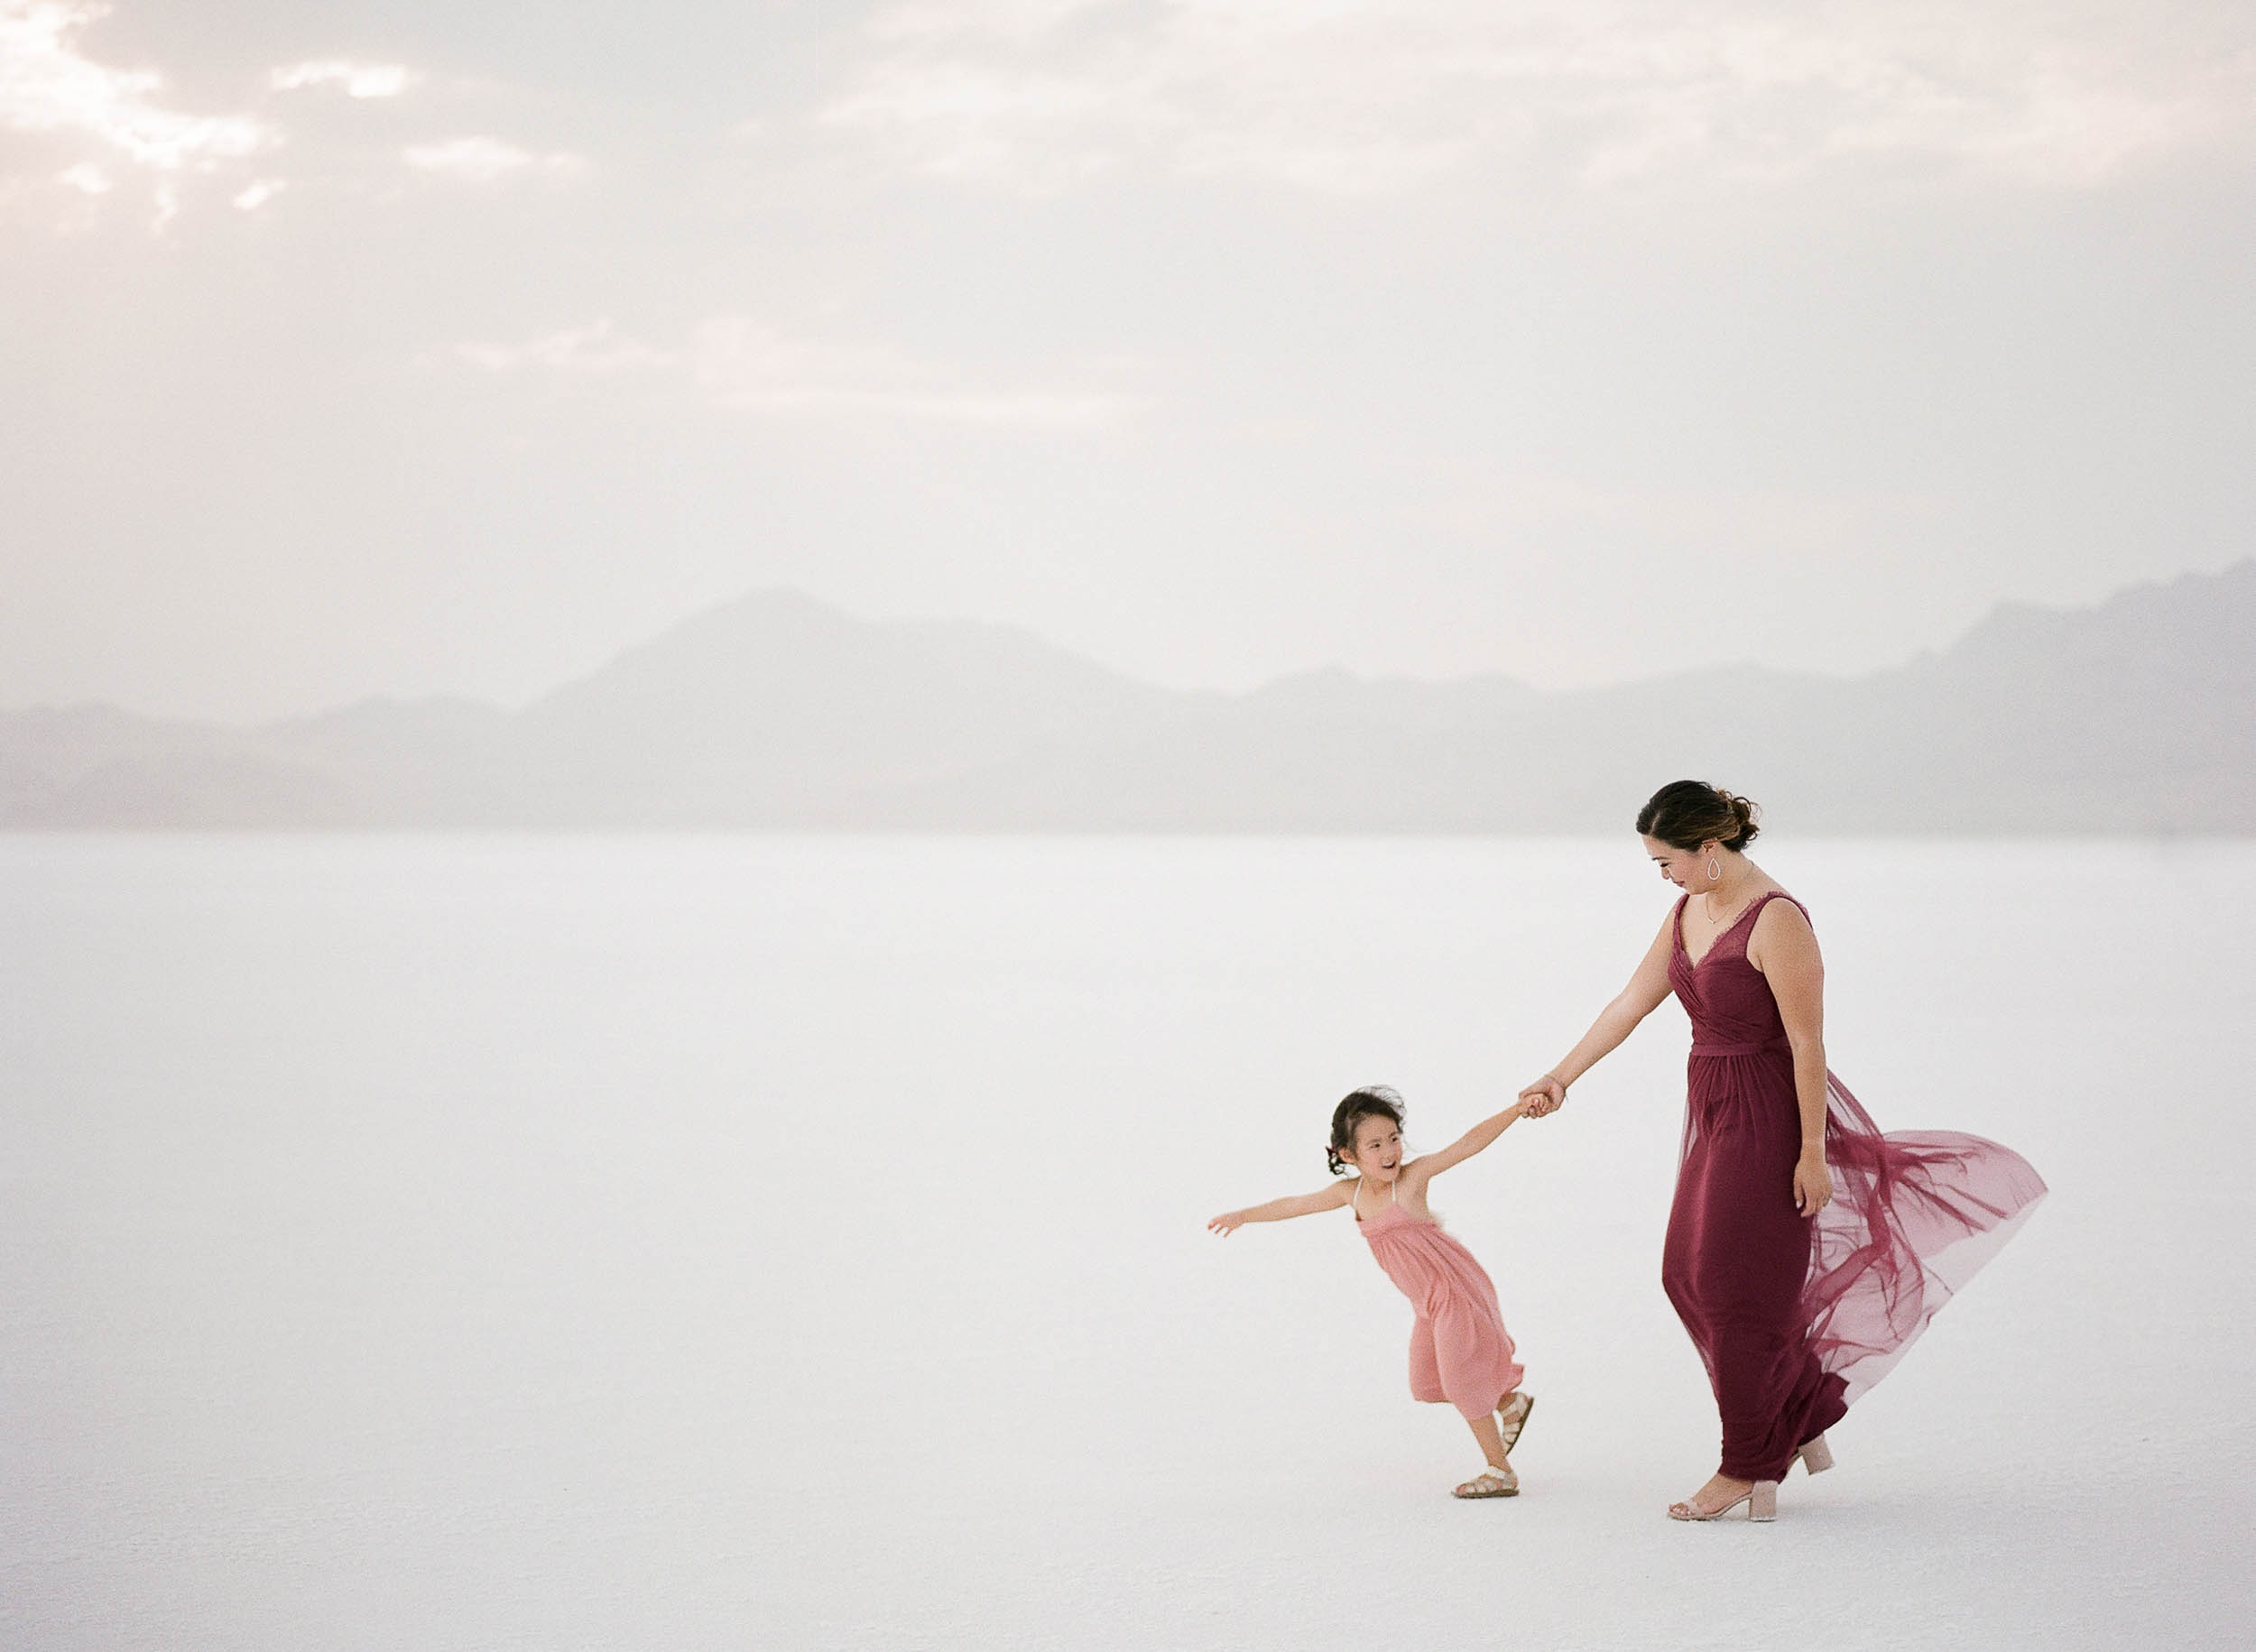 070918_Sandy A La Mode_Family_Utah Salt Flats_Buena Lane Photography_F400_47.jpg